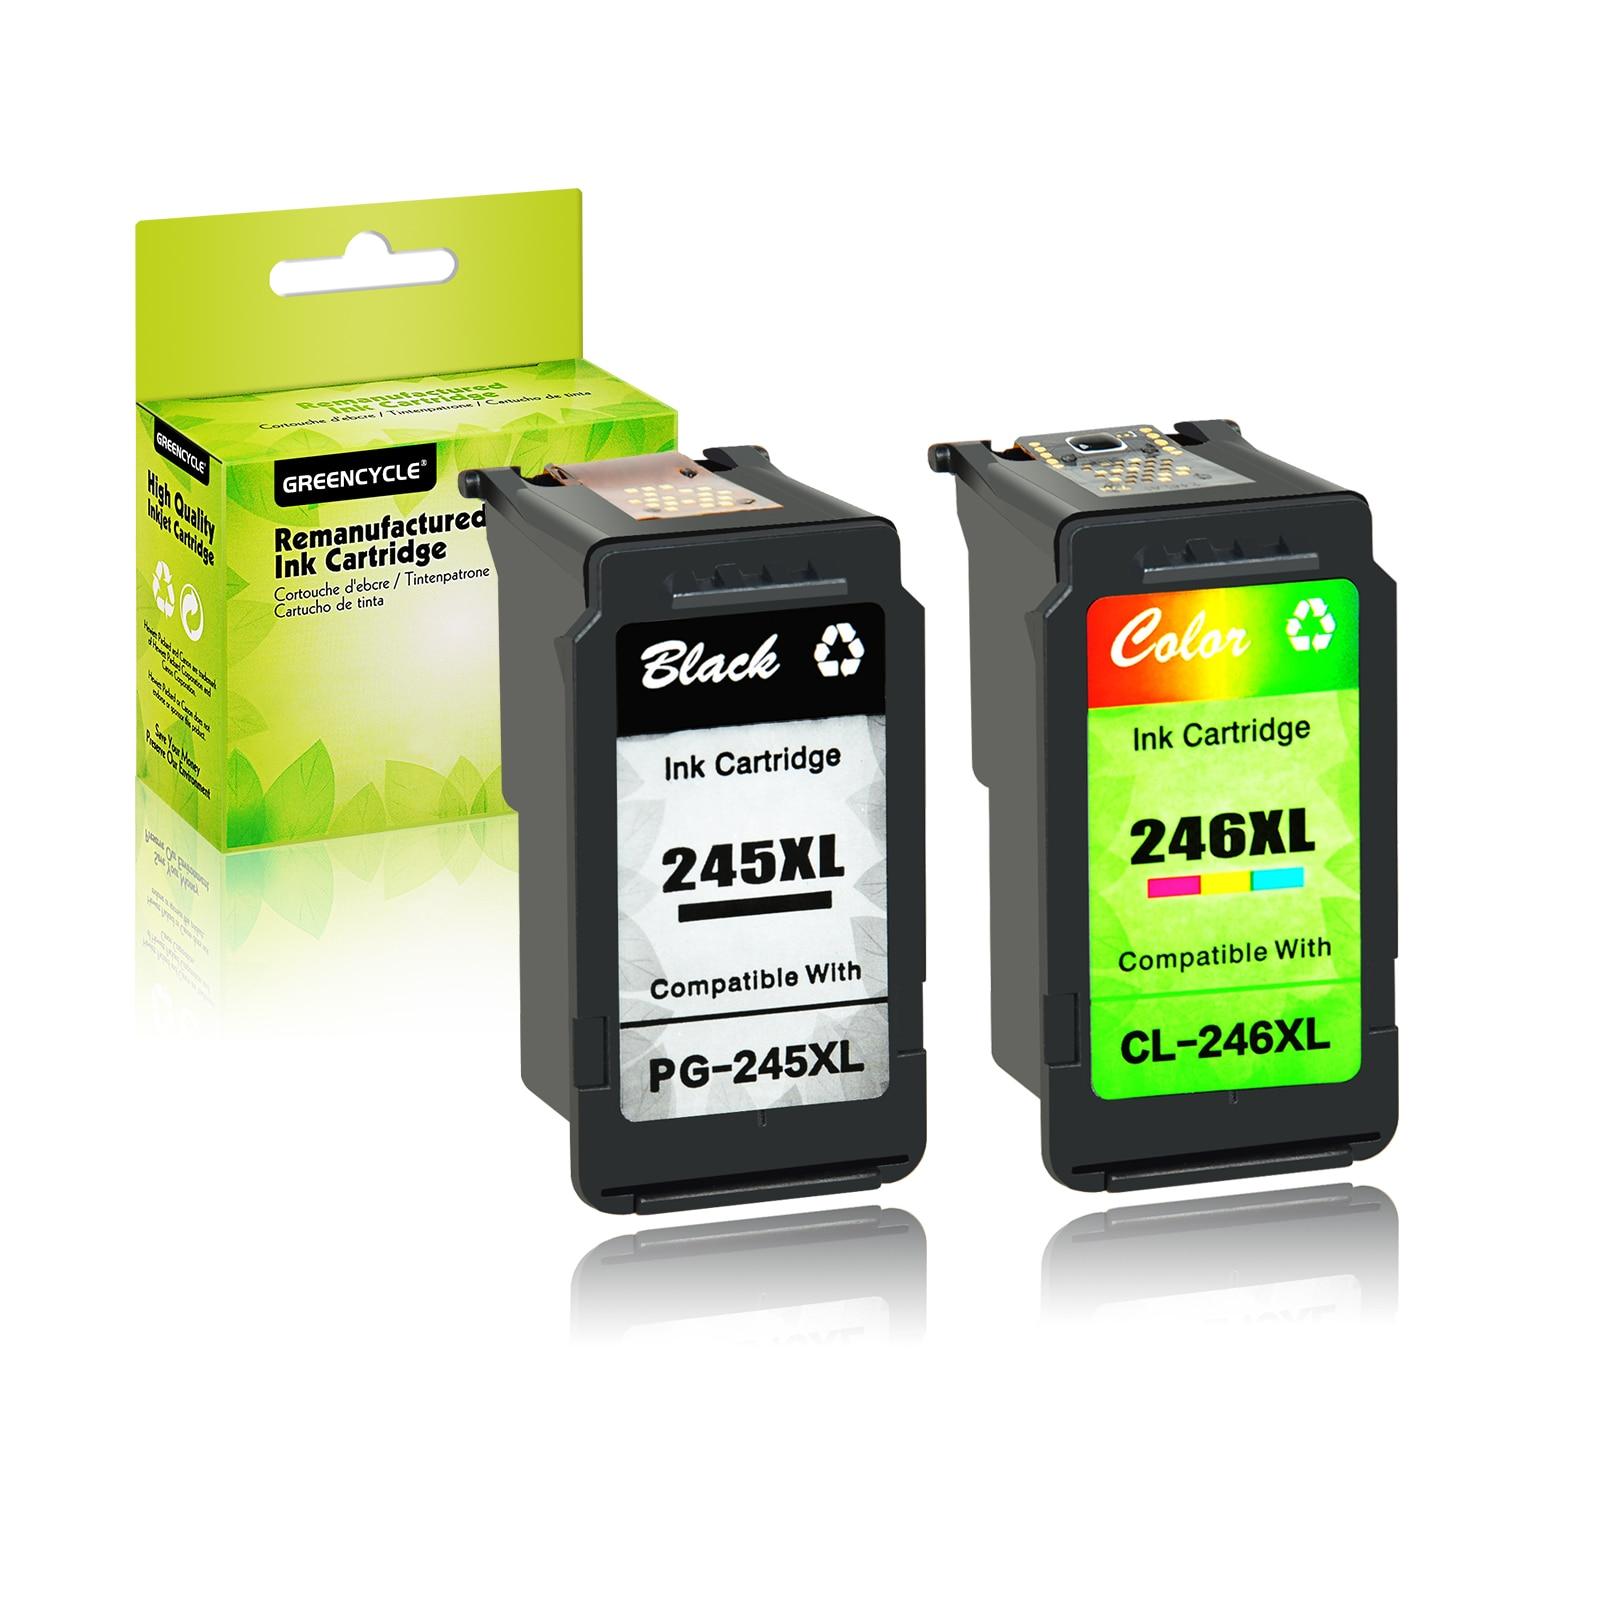 PG-245XL черный CL-246XL цветной чернильный картридж для Canon PIXMA TS3122 iP2820 MG2420 MG2520 MG2920 MG2522 MG2550 MX492 MX490 MX495